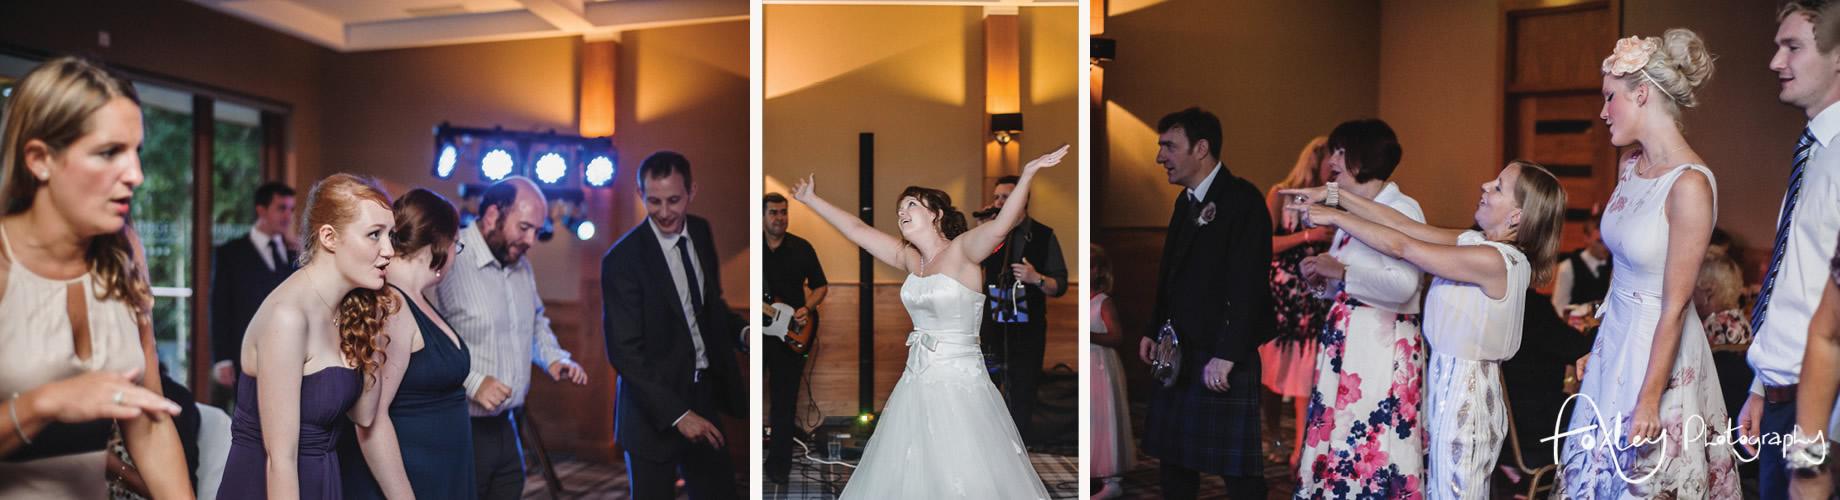 Alys-And-Davids-Wedding-Loch-Lomond-189